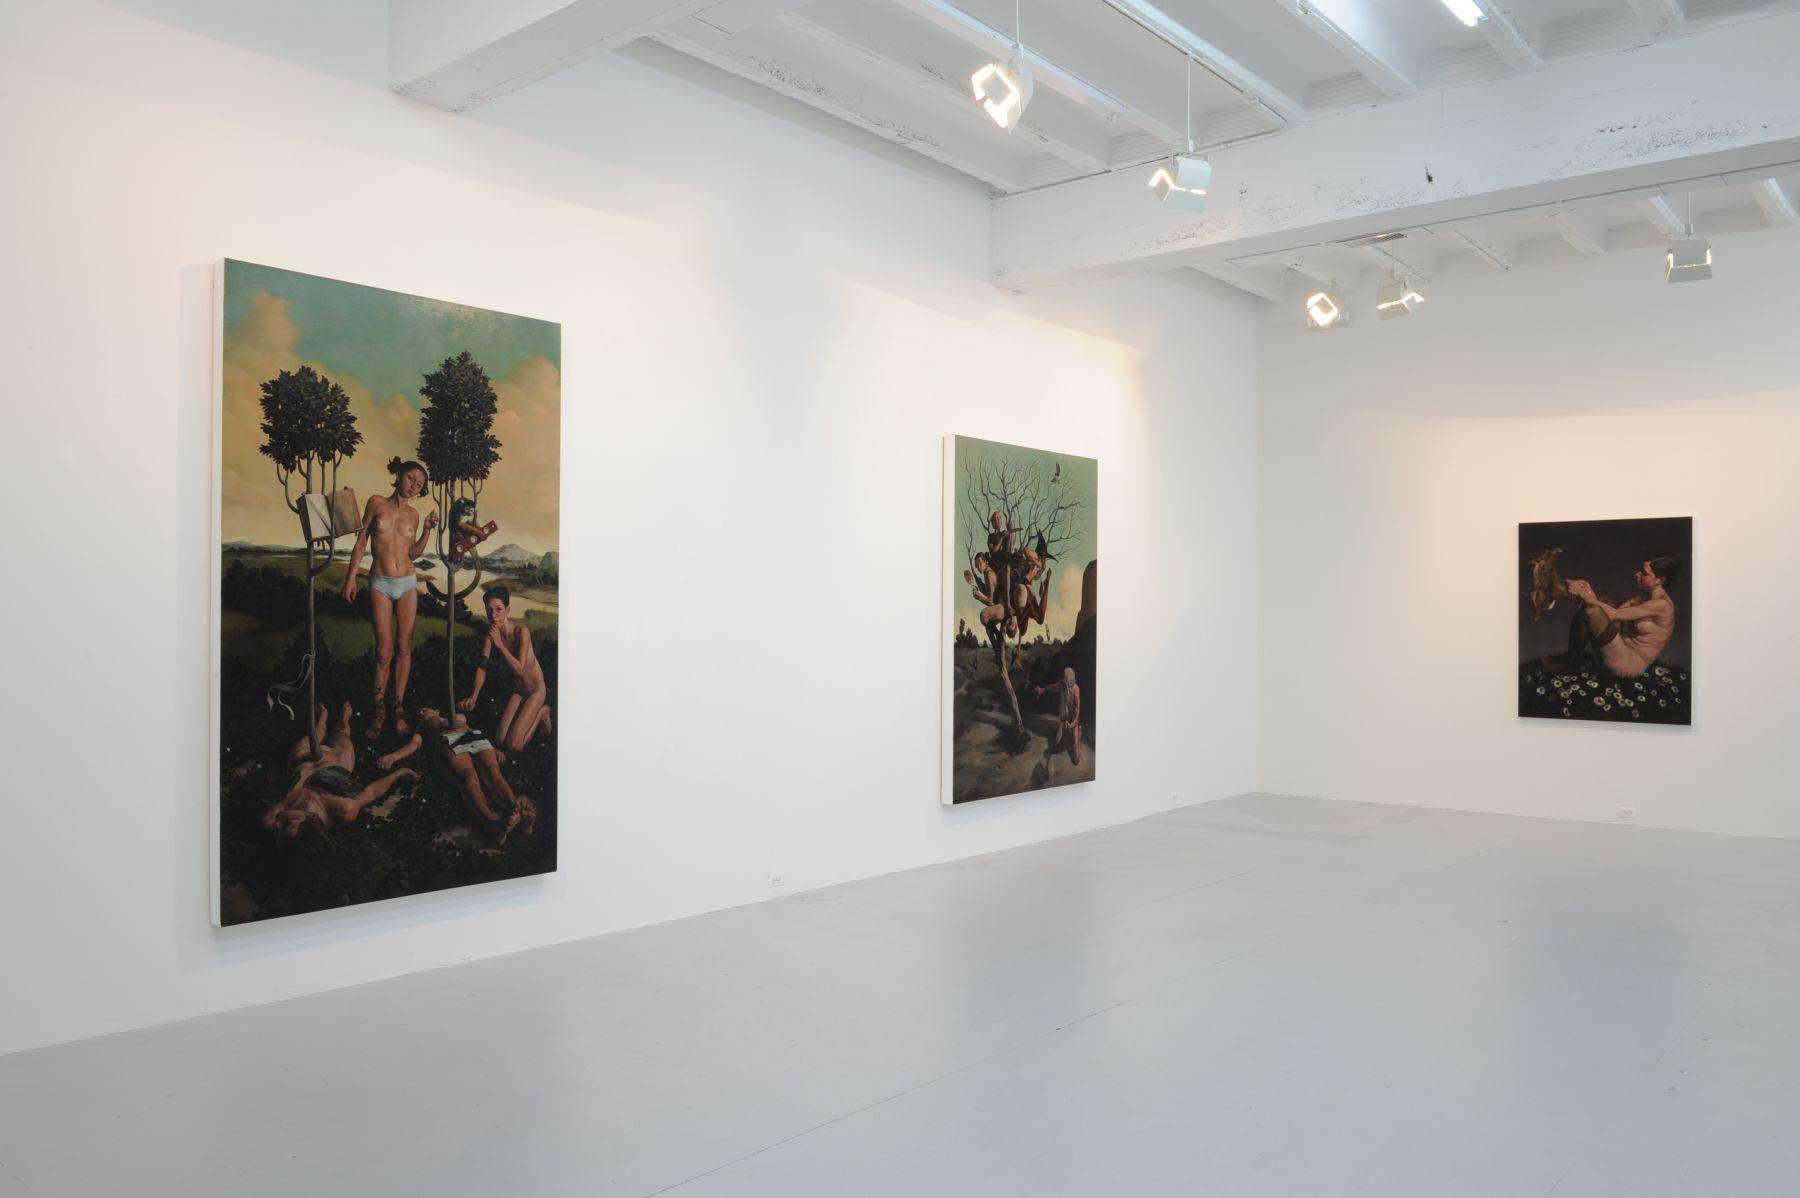 Erik Thor Sandberg_Cyclical Nature_Conner Contemporary Art